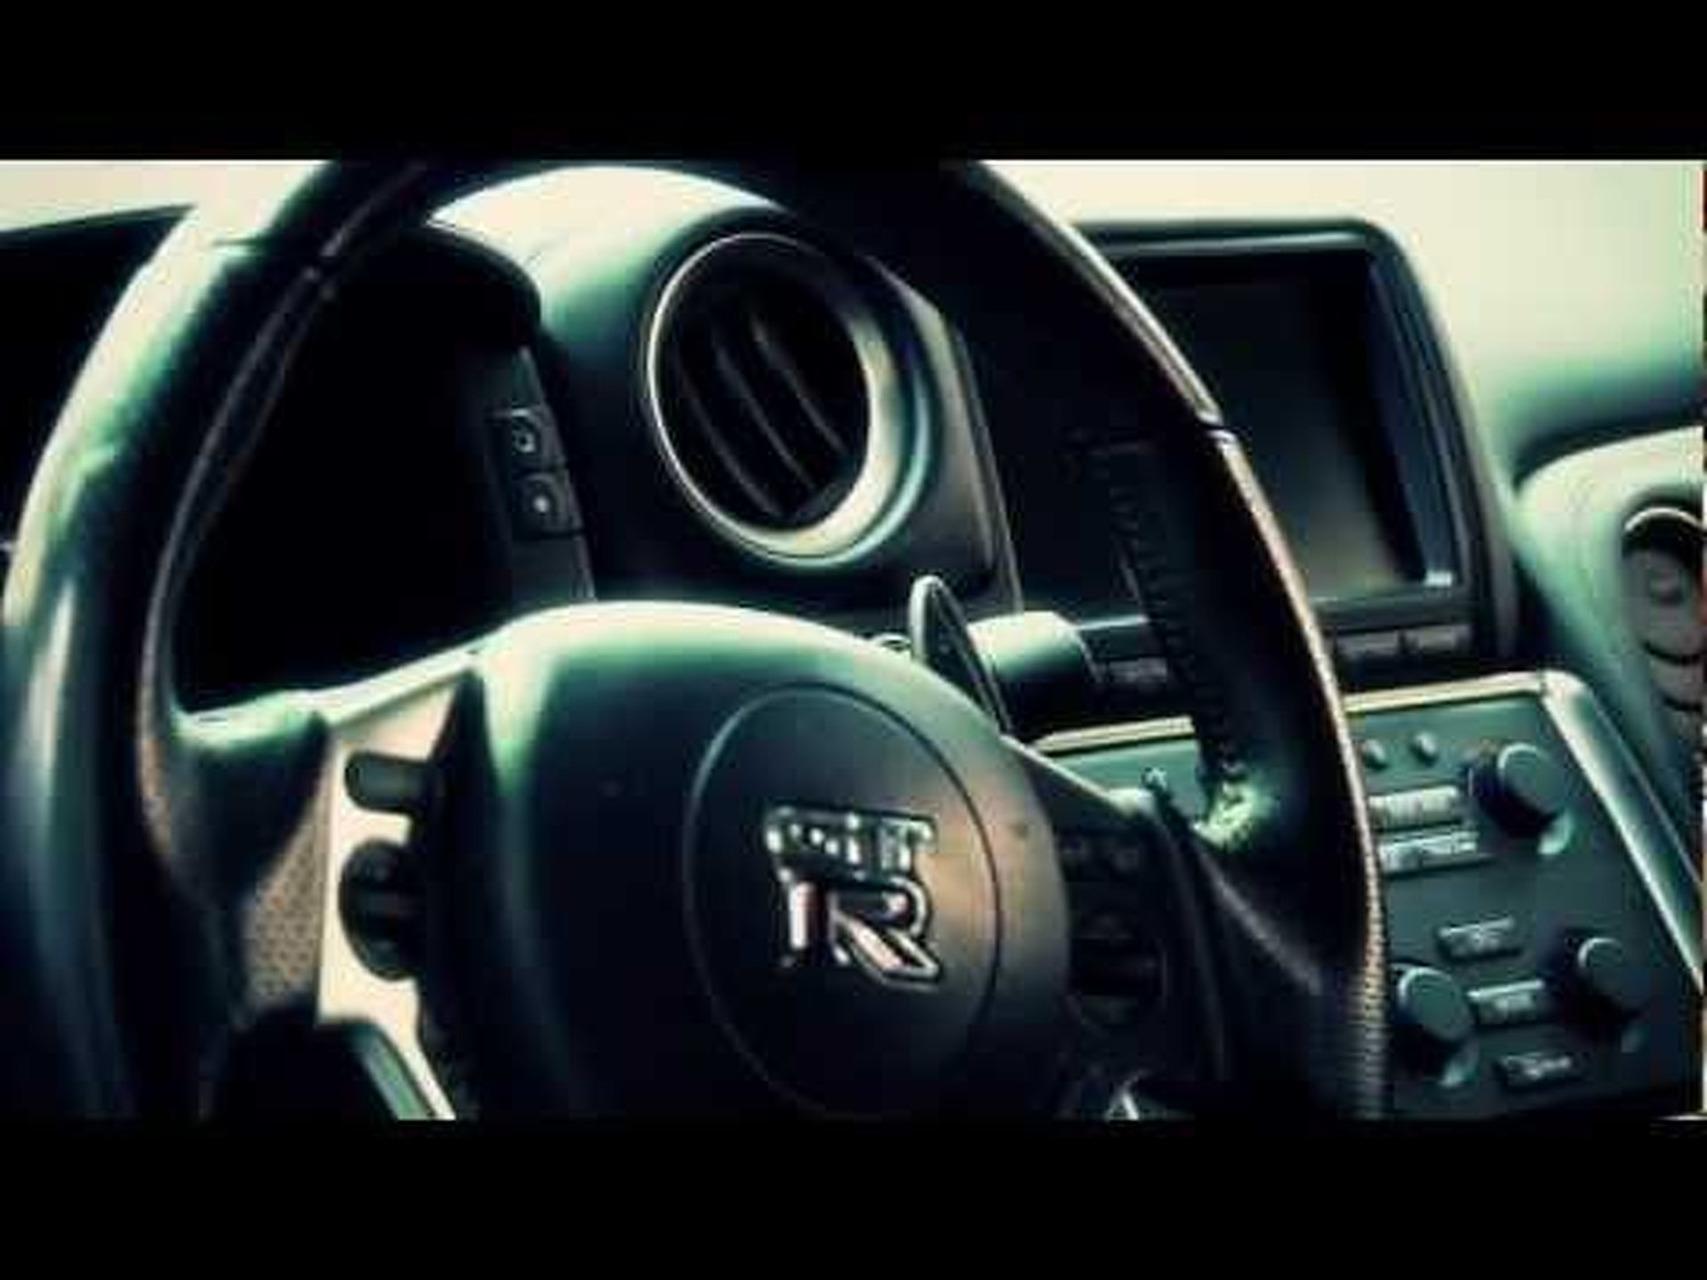 2011 Nissan Juke-R Concept - Handling